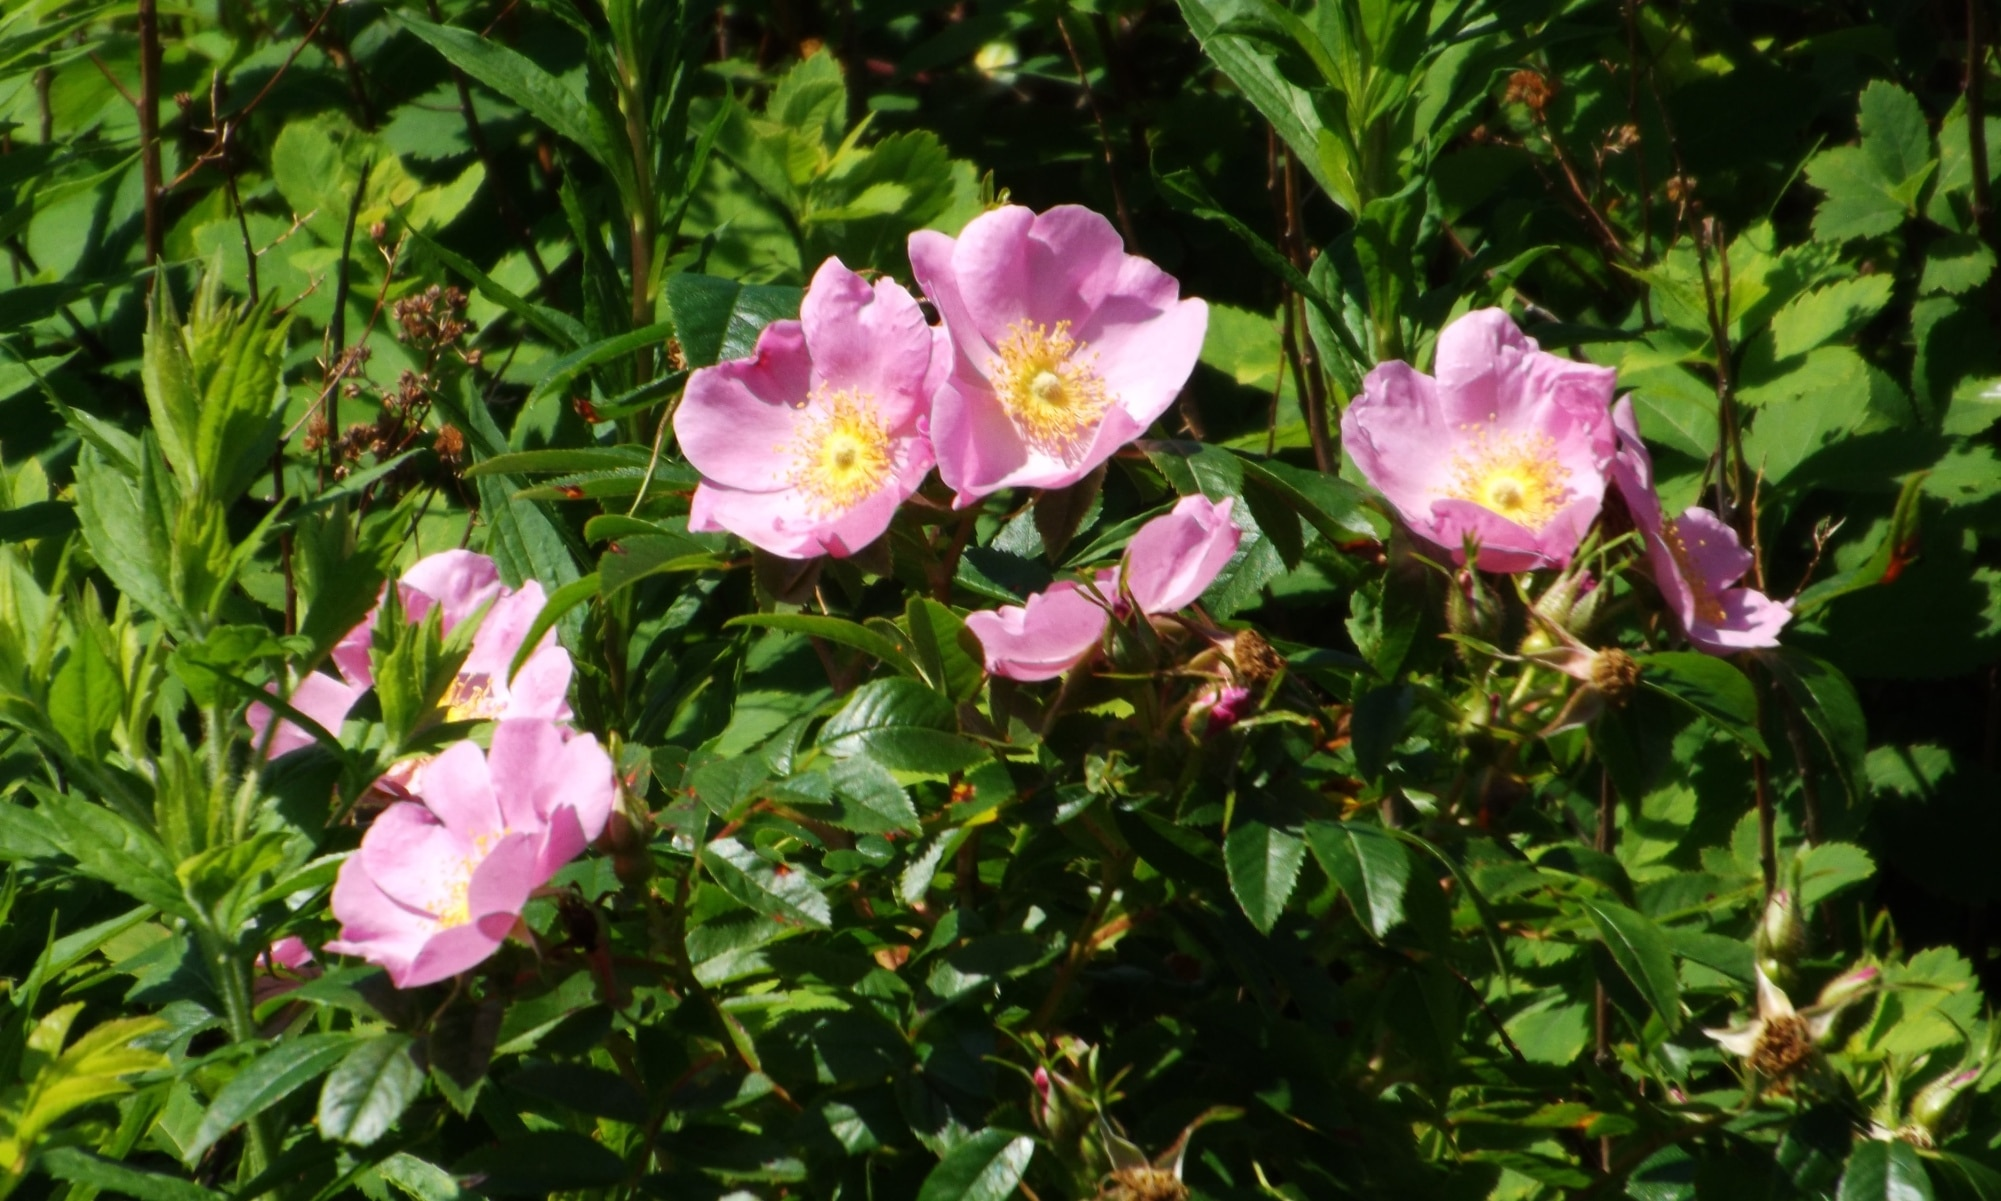 Wild-Roses-DSCF8082